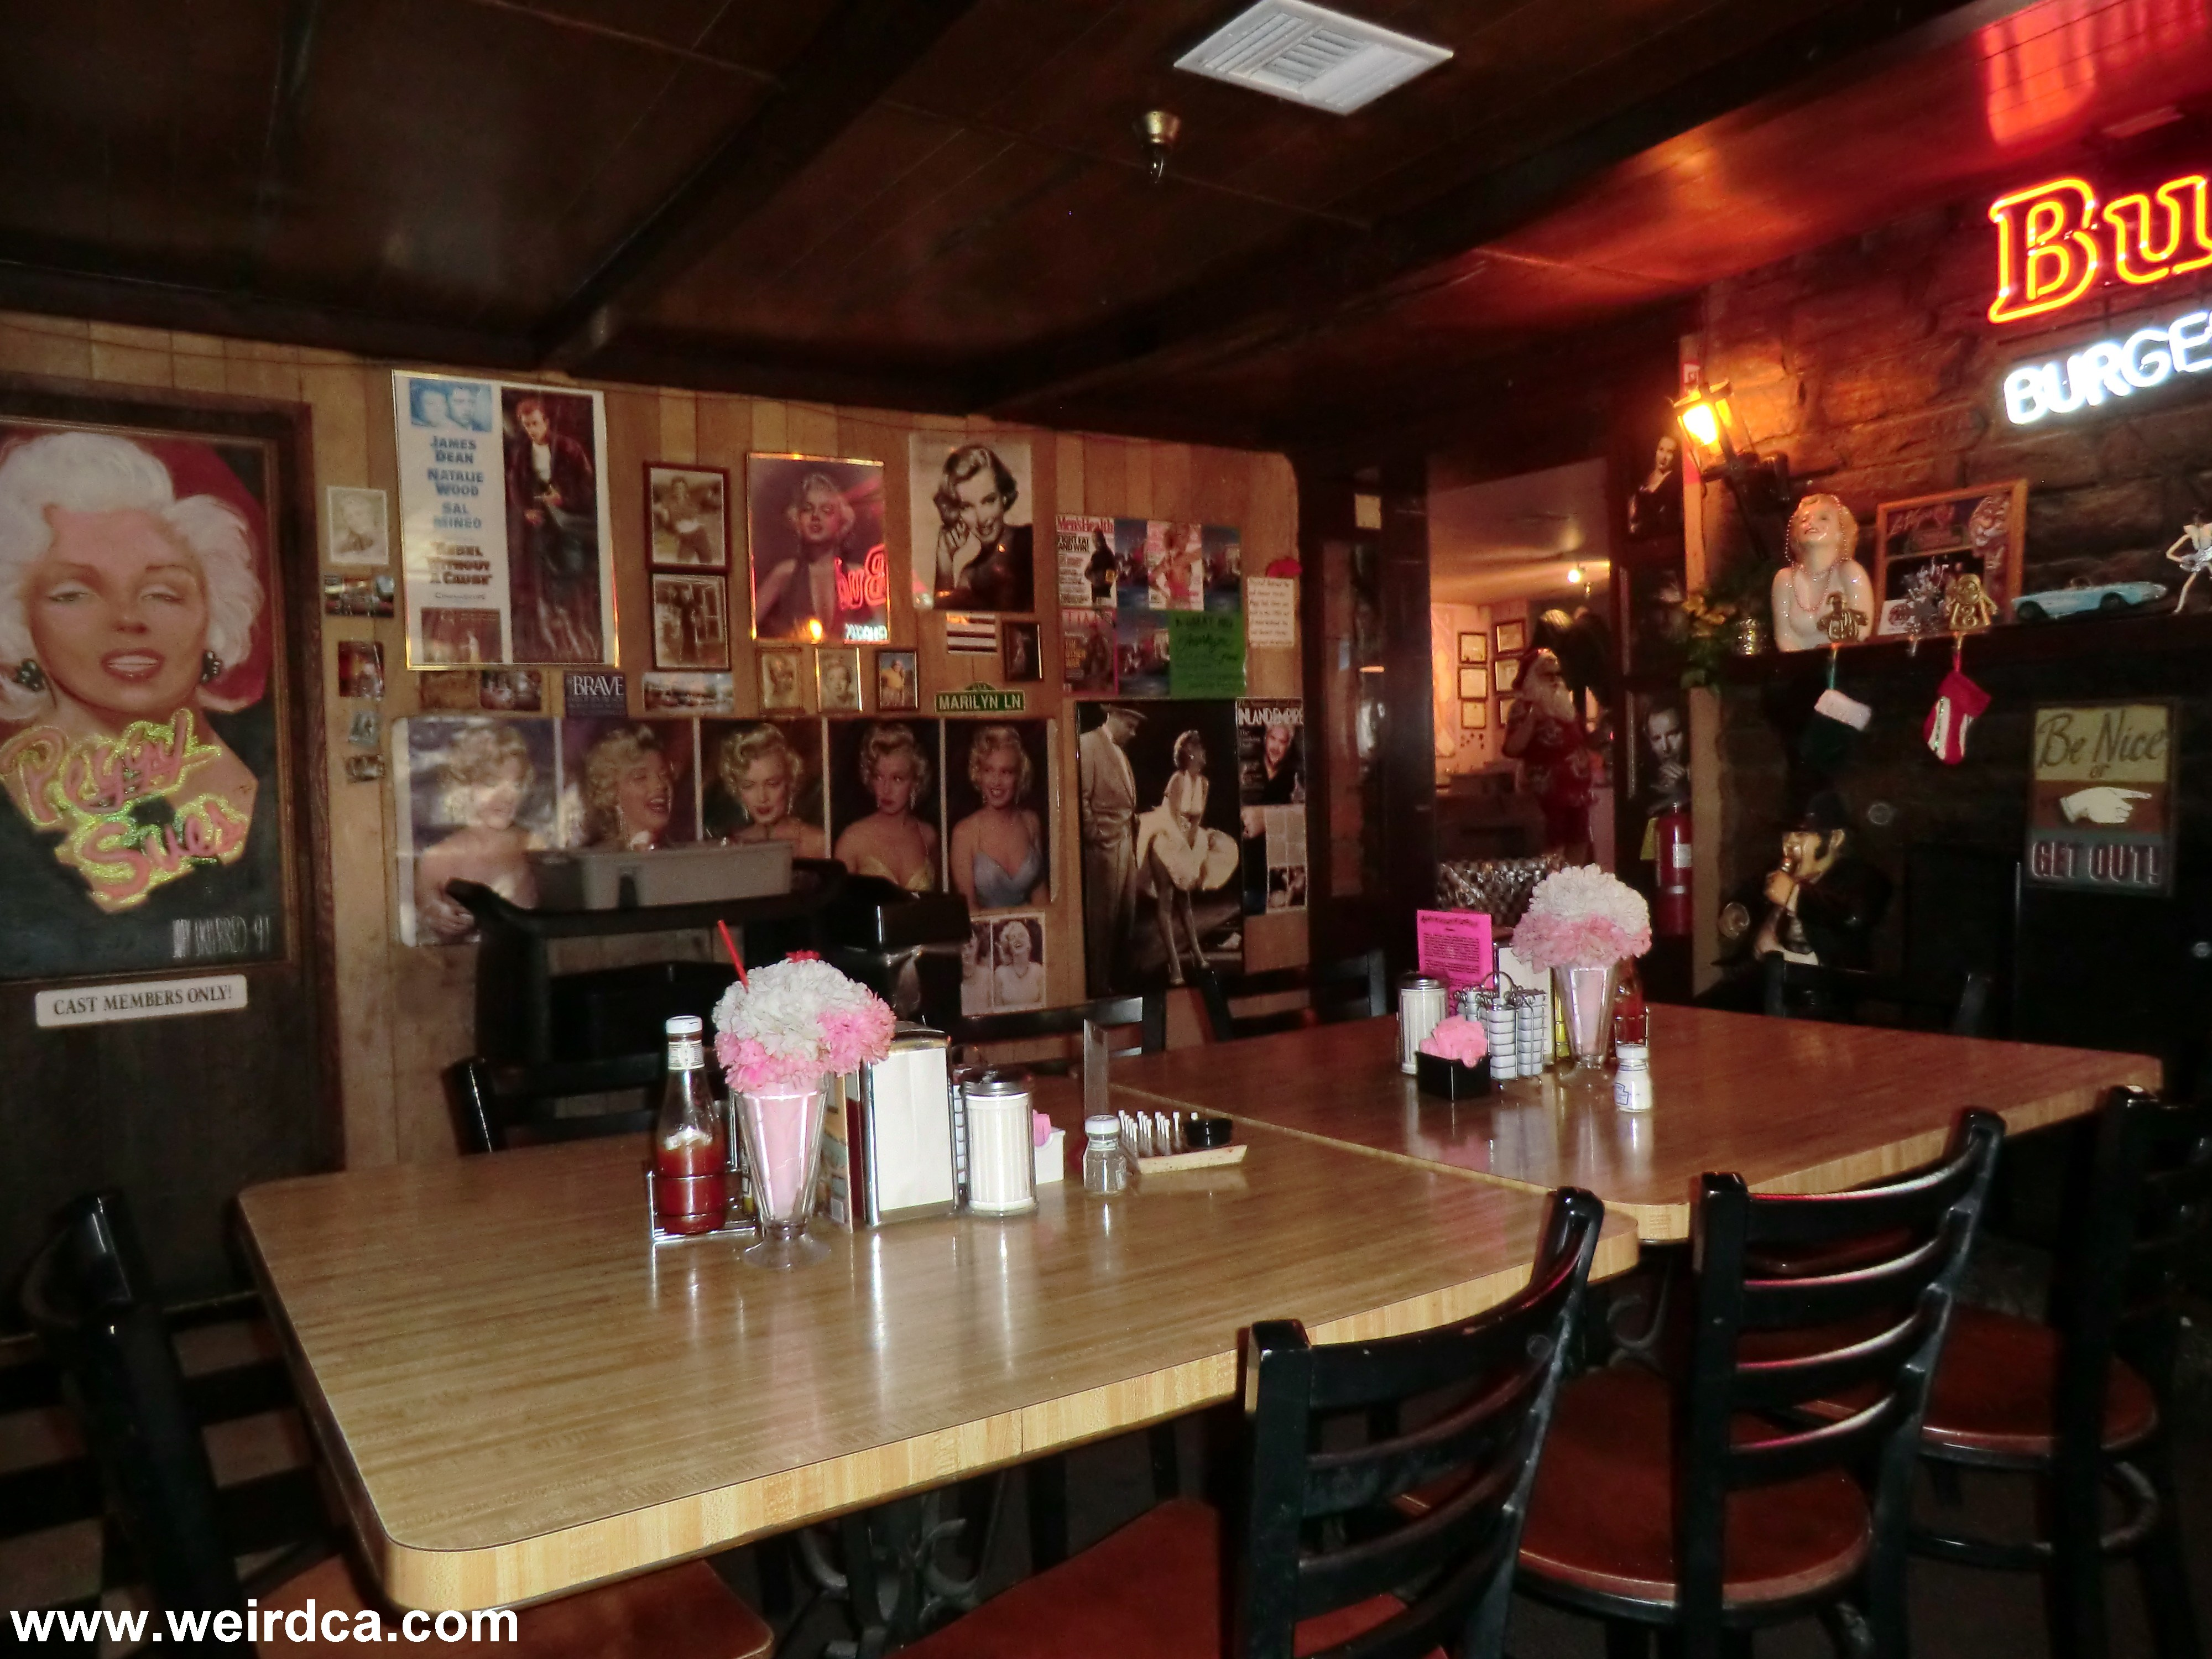 Peggy Sue's 50's Diner - Weird California  Peggy Sue's...